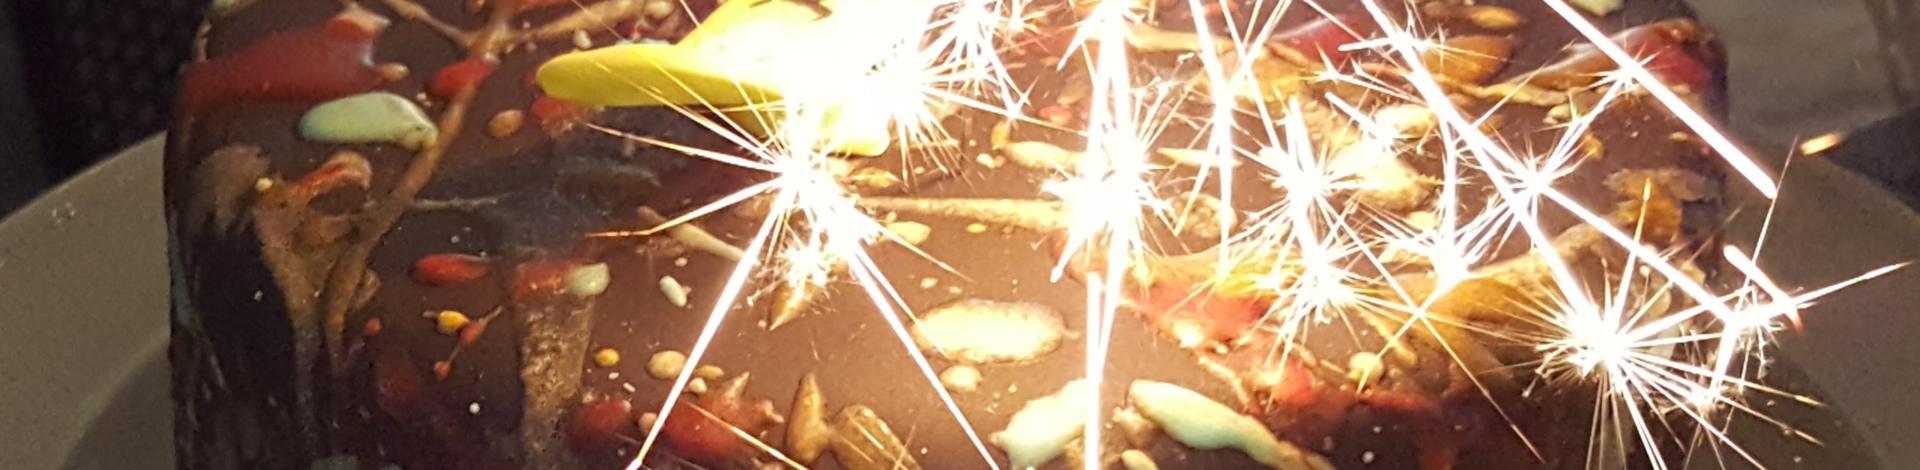 Birthday Cake Sparkels